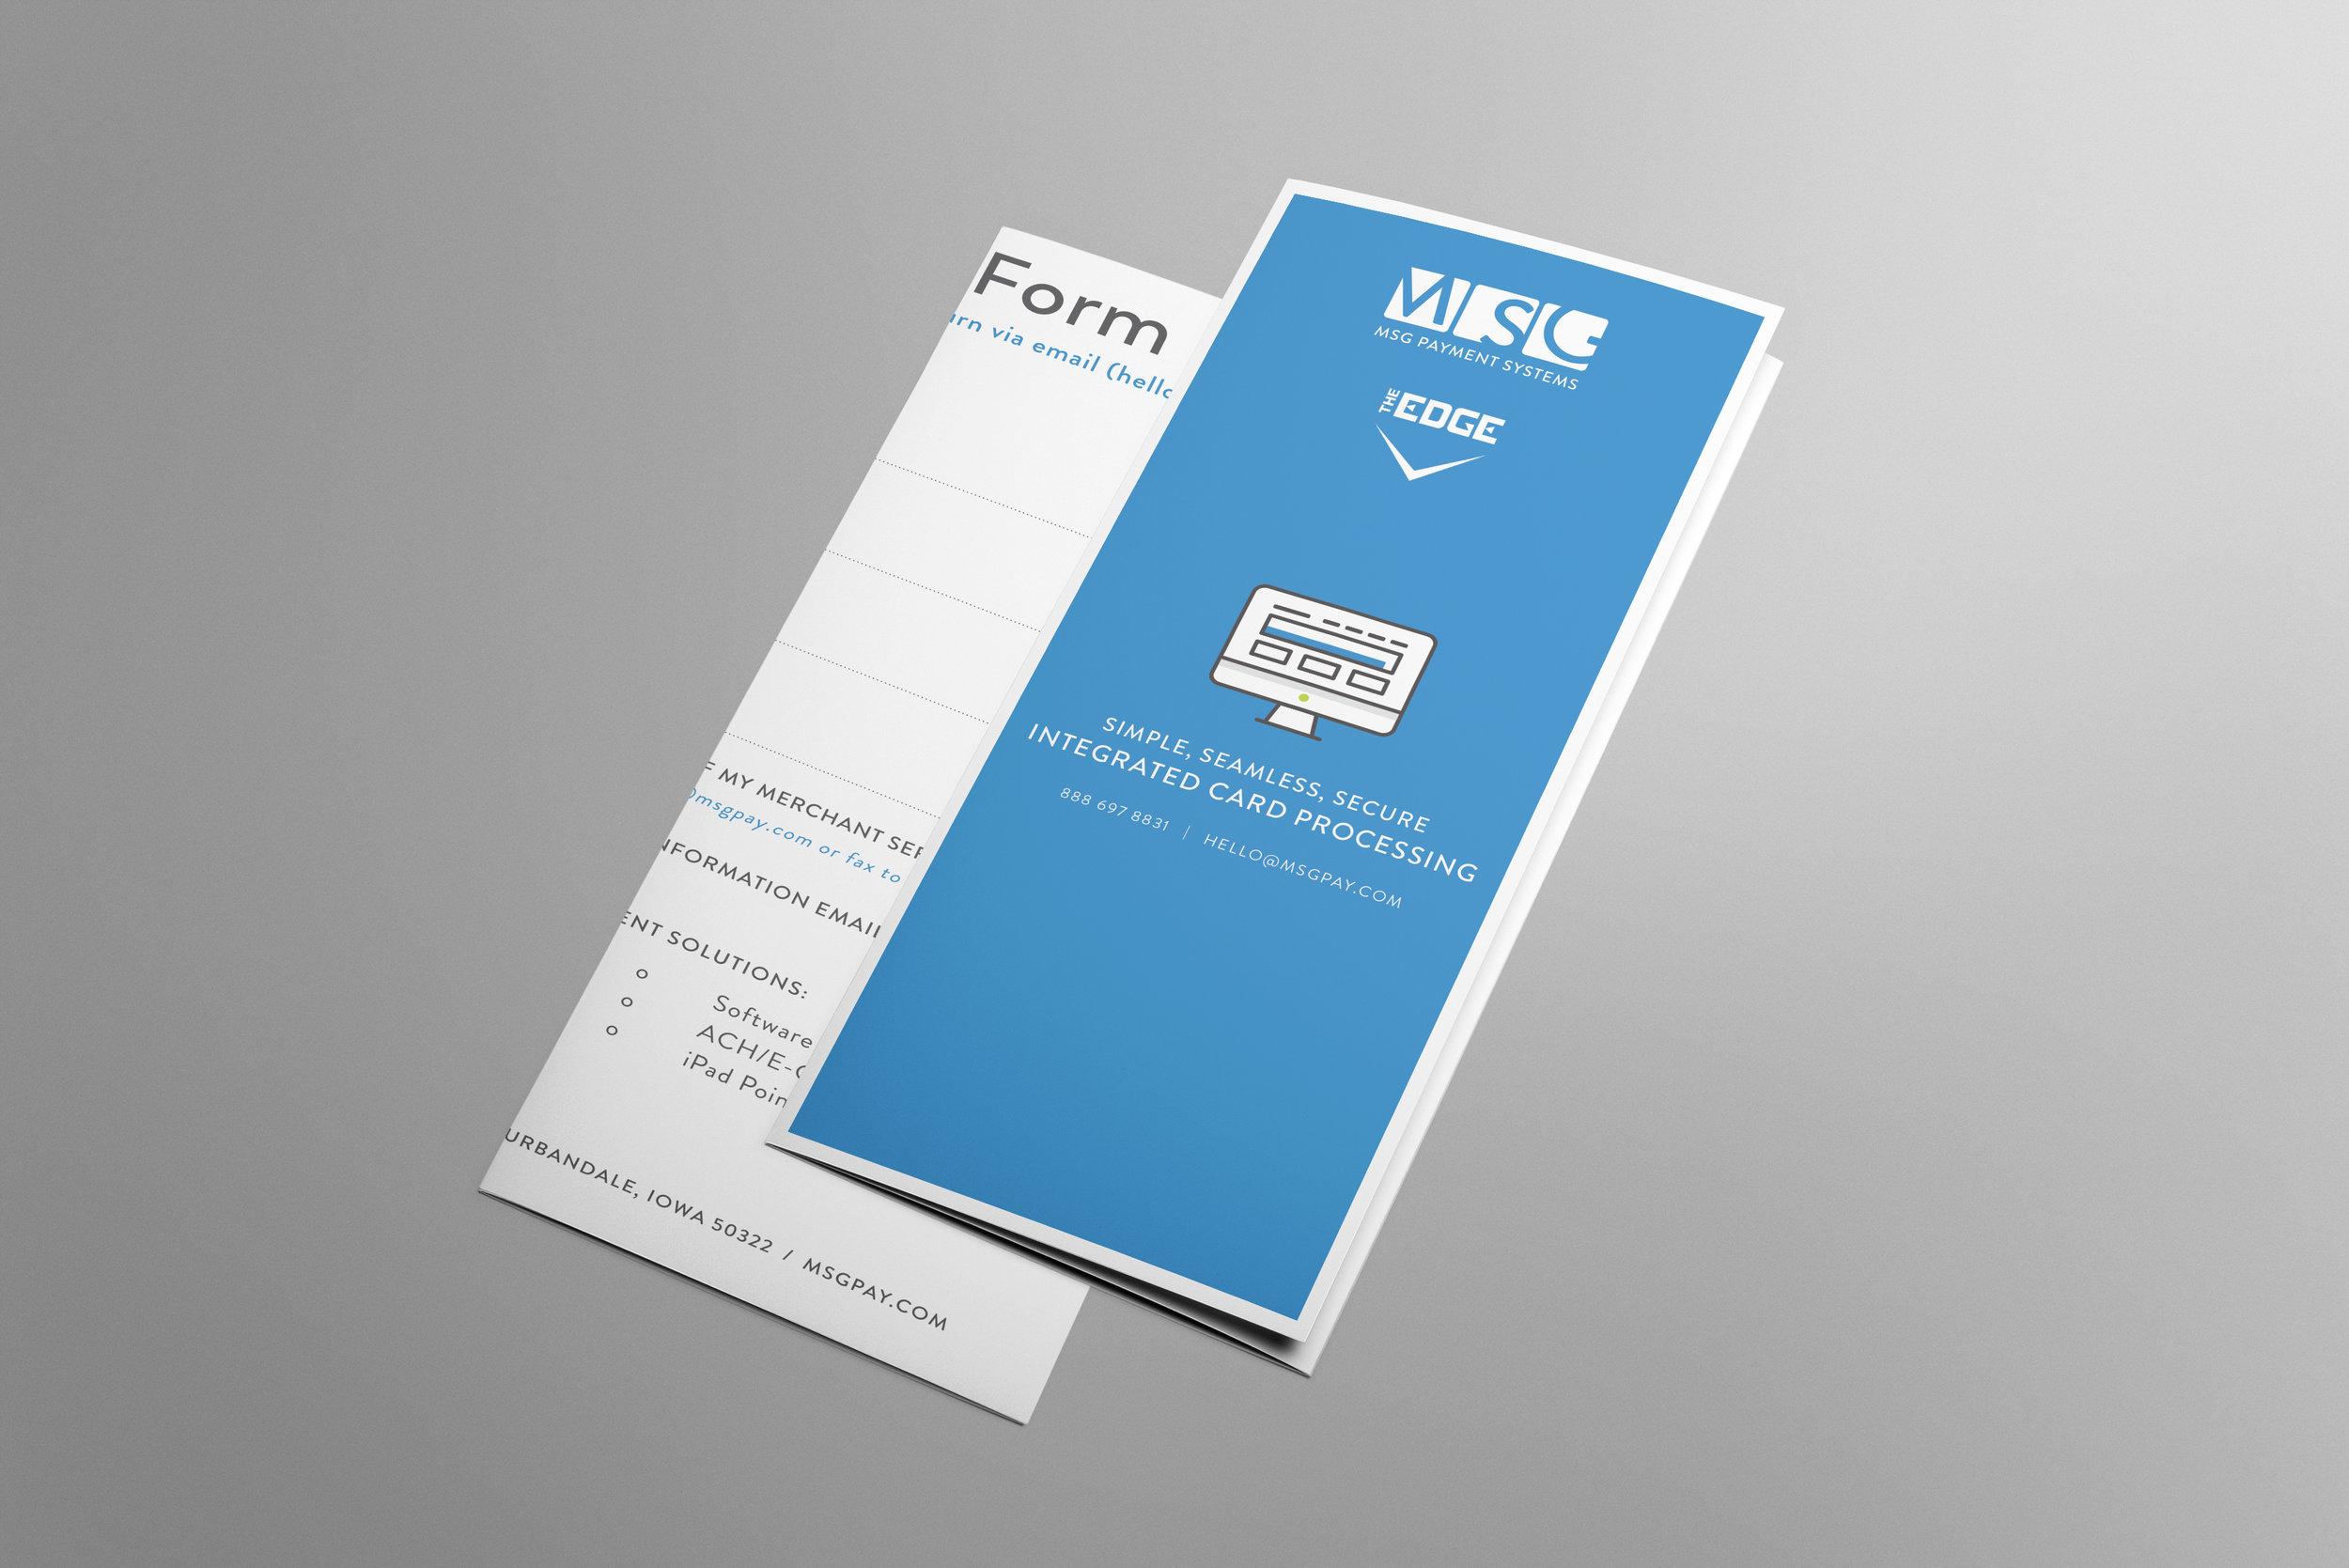 01-tri-fold-brochure-letter-mockup2.jpg